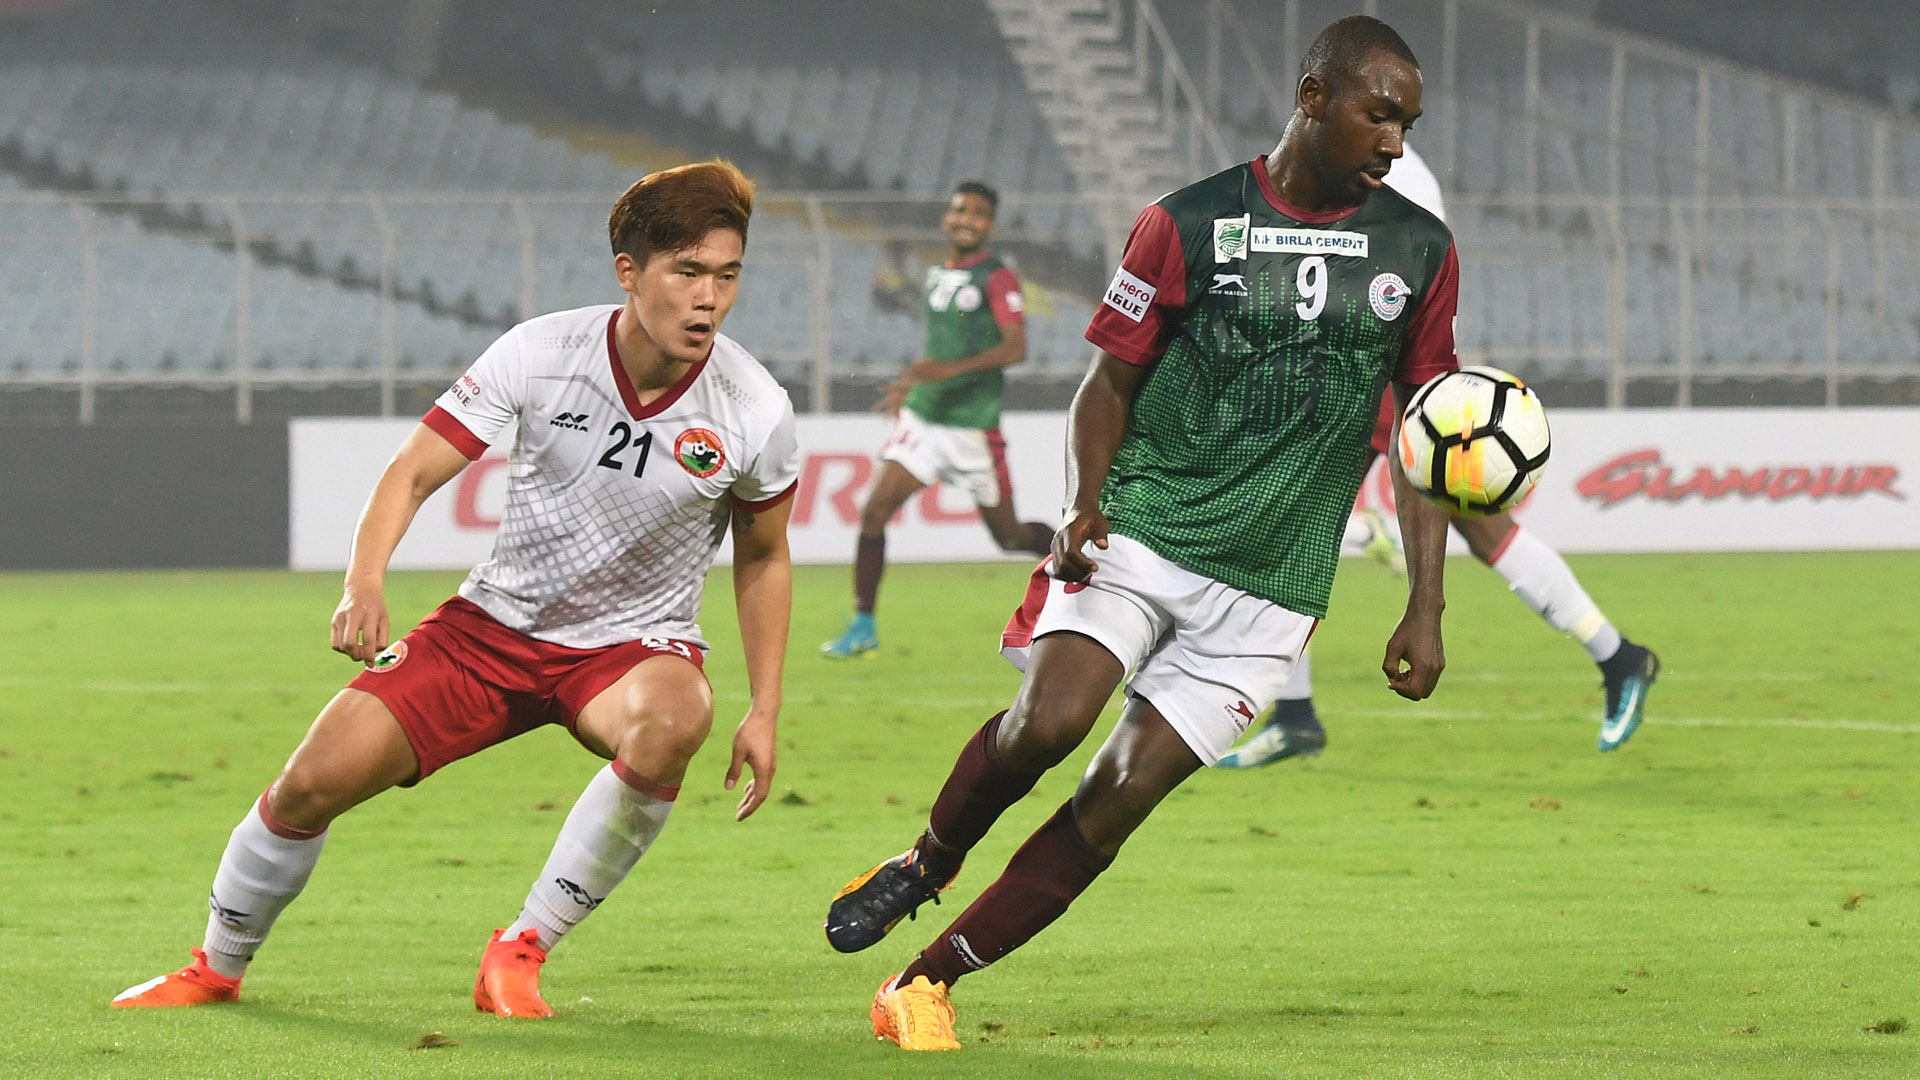 Juho Oh Dipanda Dicka Mohun Bagan Shillong Lajong FC I-League 2017/2018